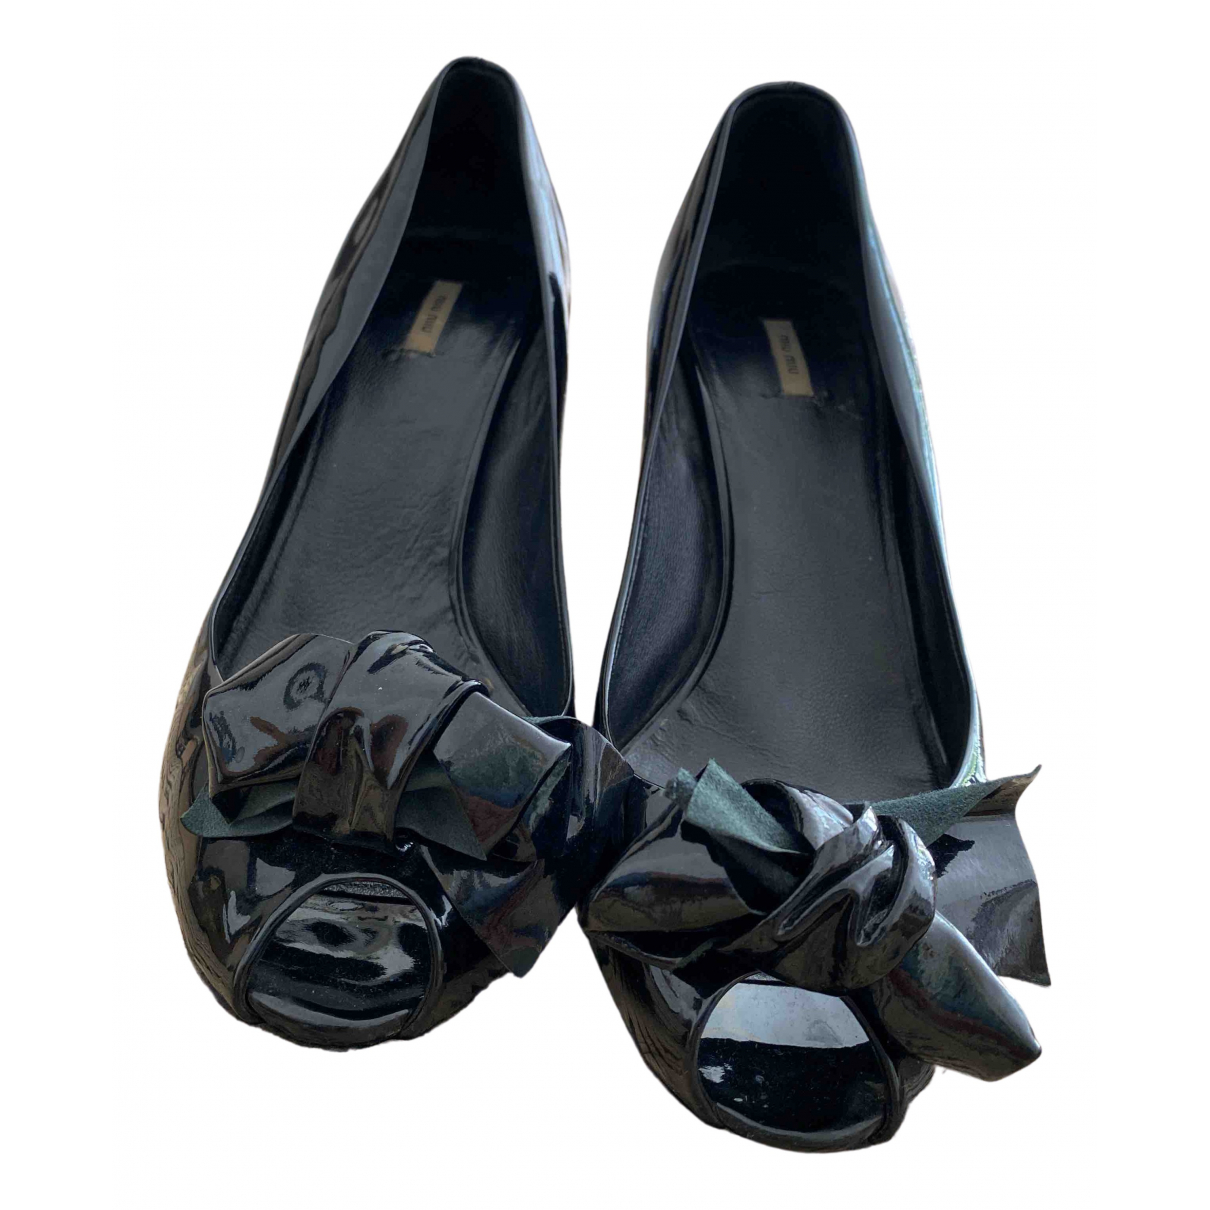 Miu Miu \N Black Patent leather Heels for Women 41 EU